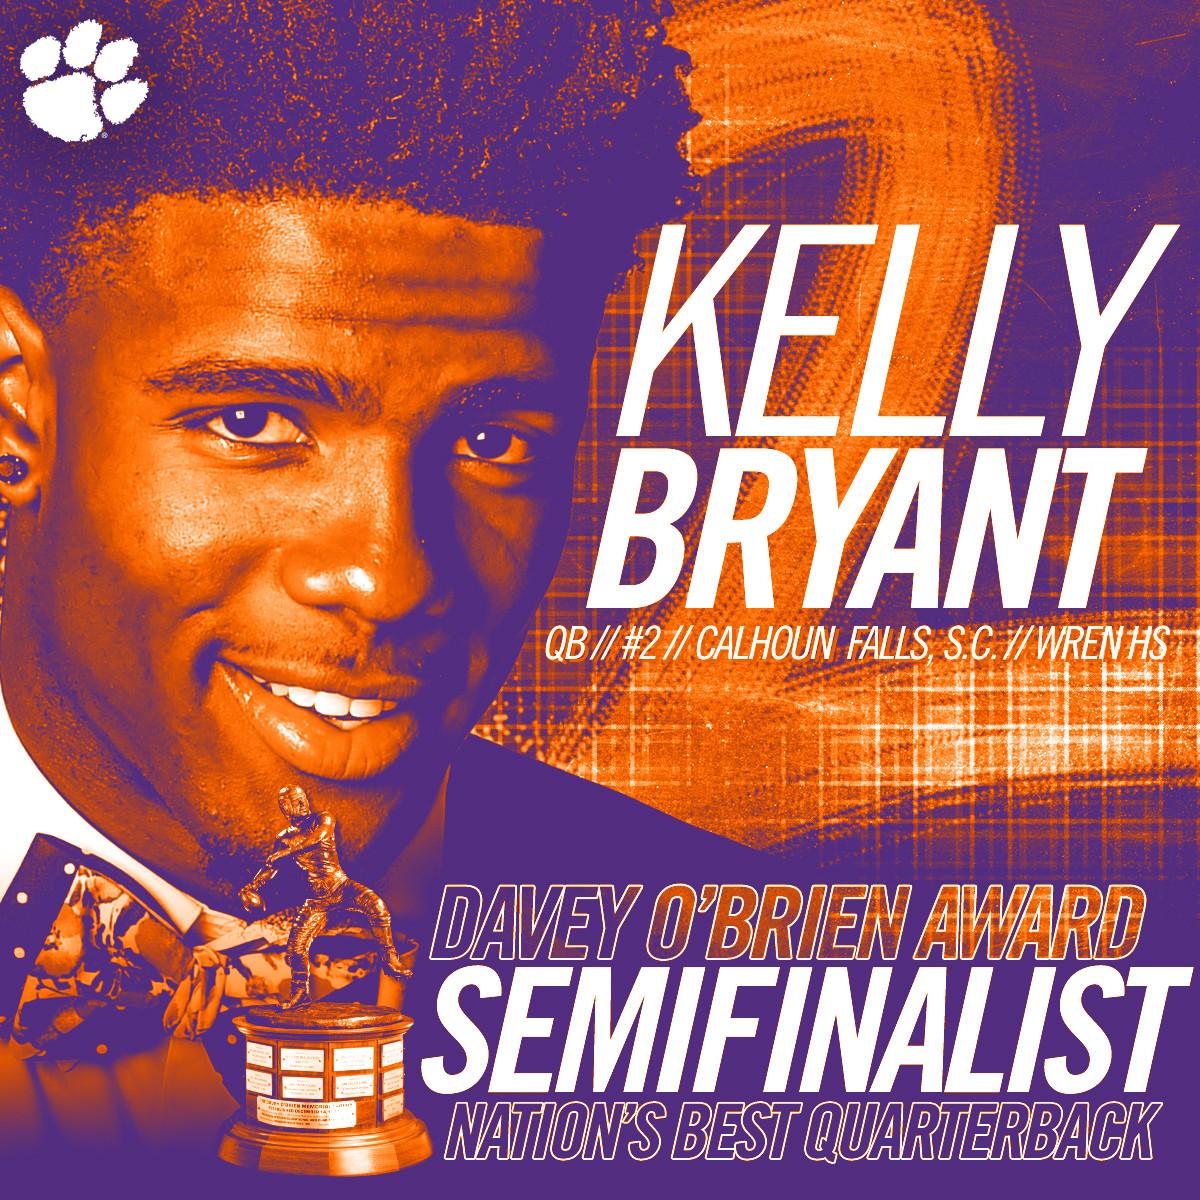 Bryant Semifinalist for O'Brien Award